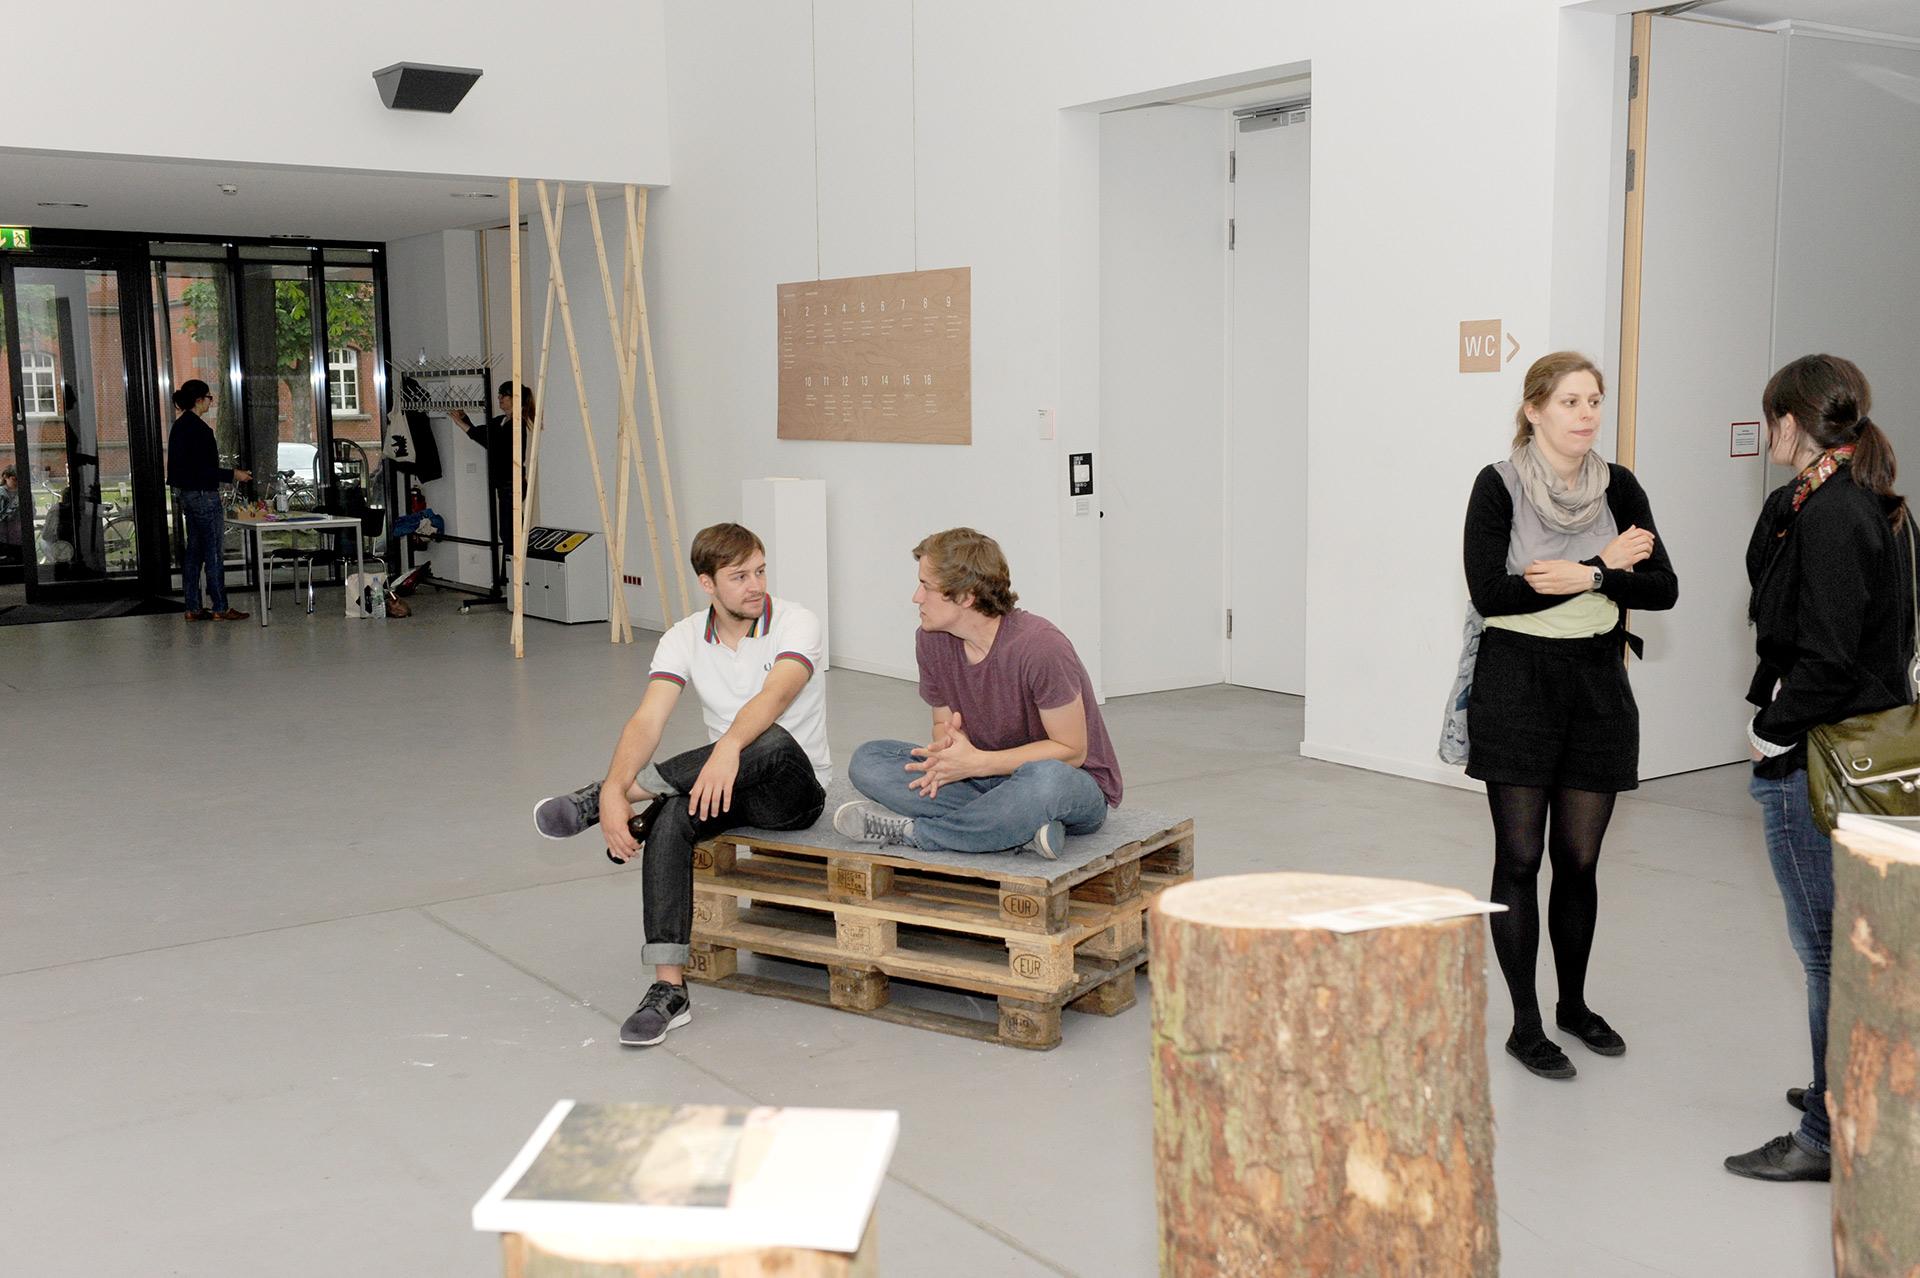 Parcours, Design, Konzept, Münster, Layout, Ausstellung, Fh, Katalog, Abschluss, Grafik